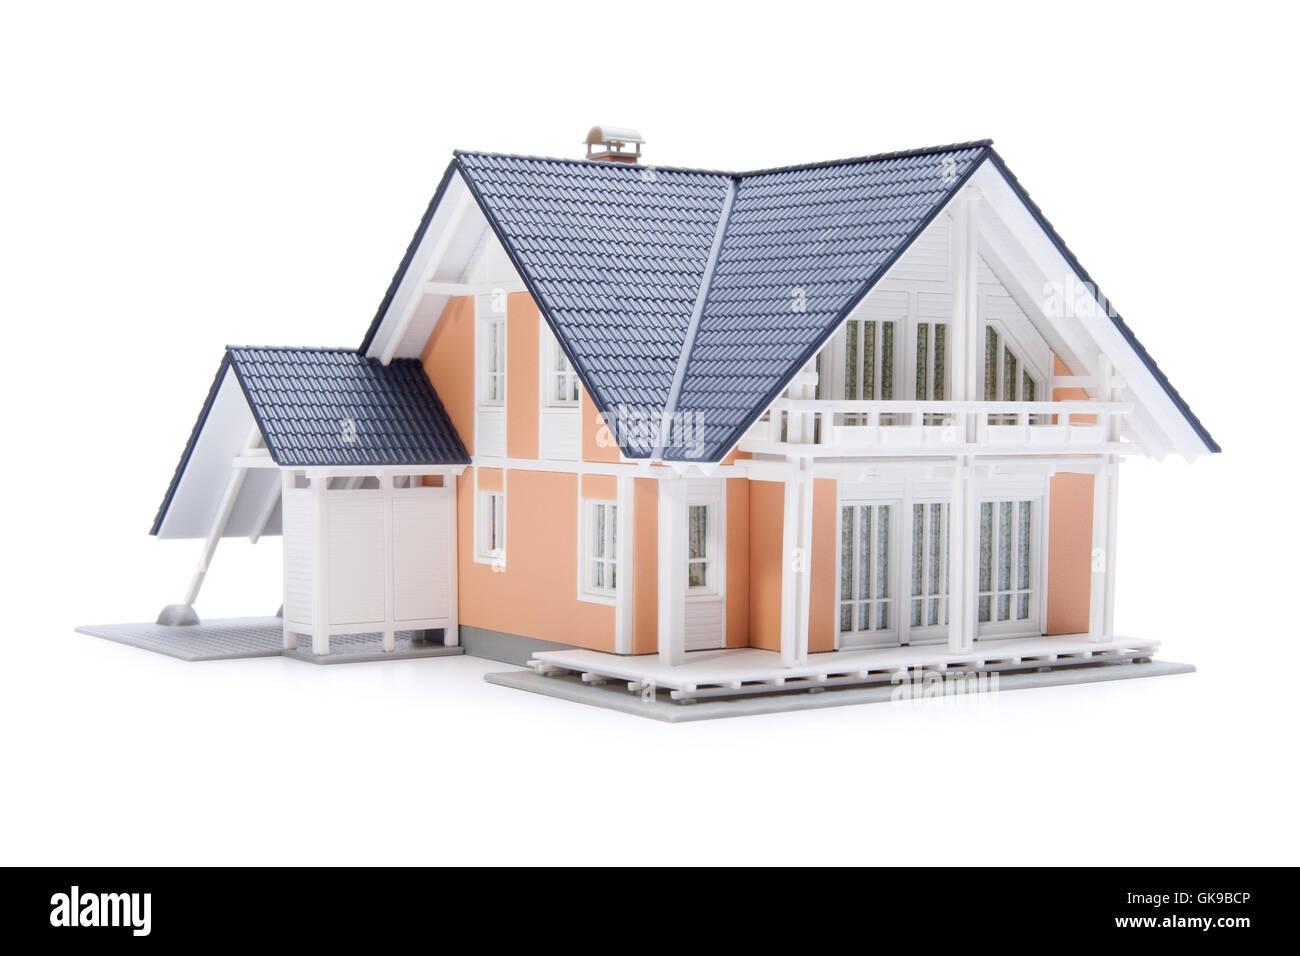 Costruzione casa di abitazione Immagini Stock